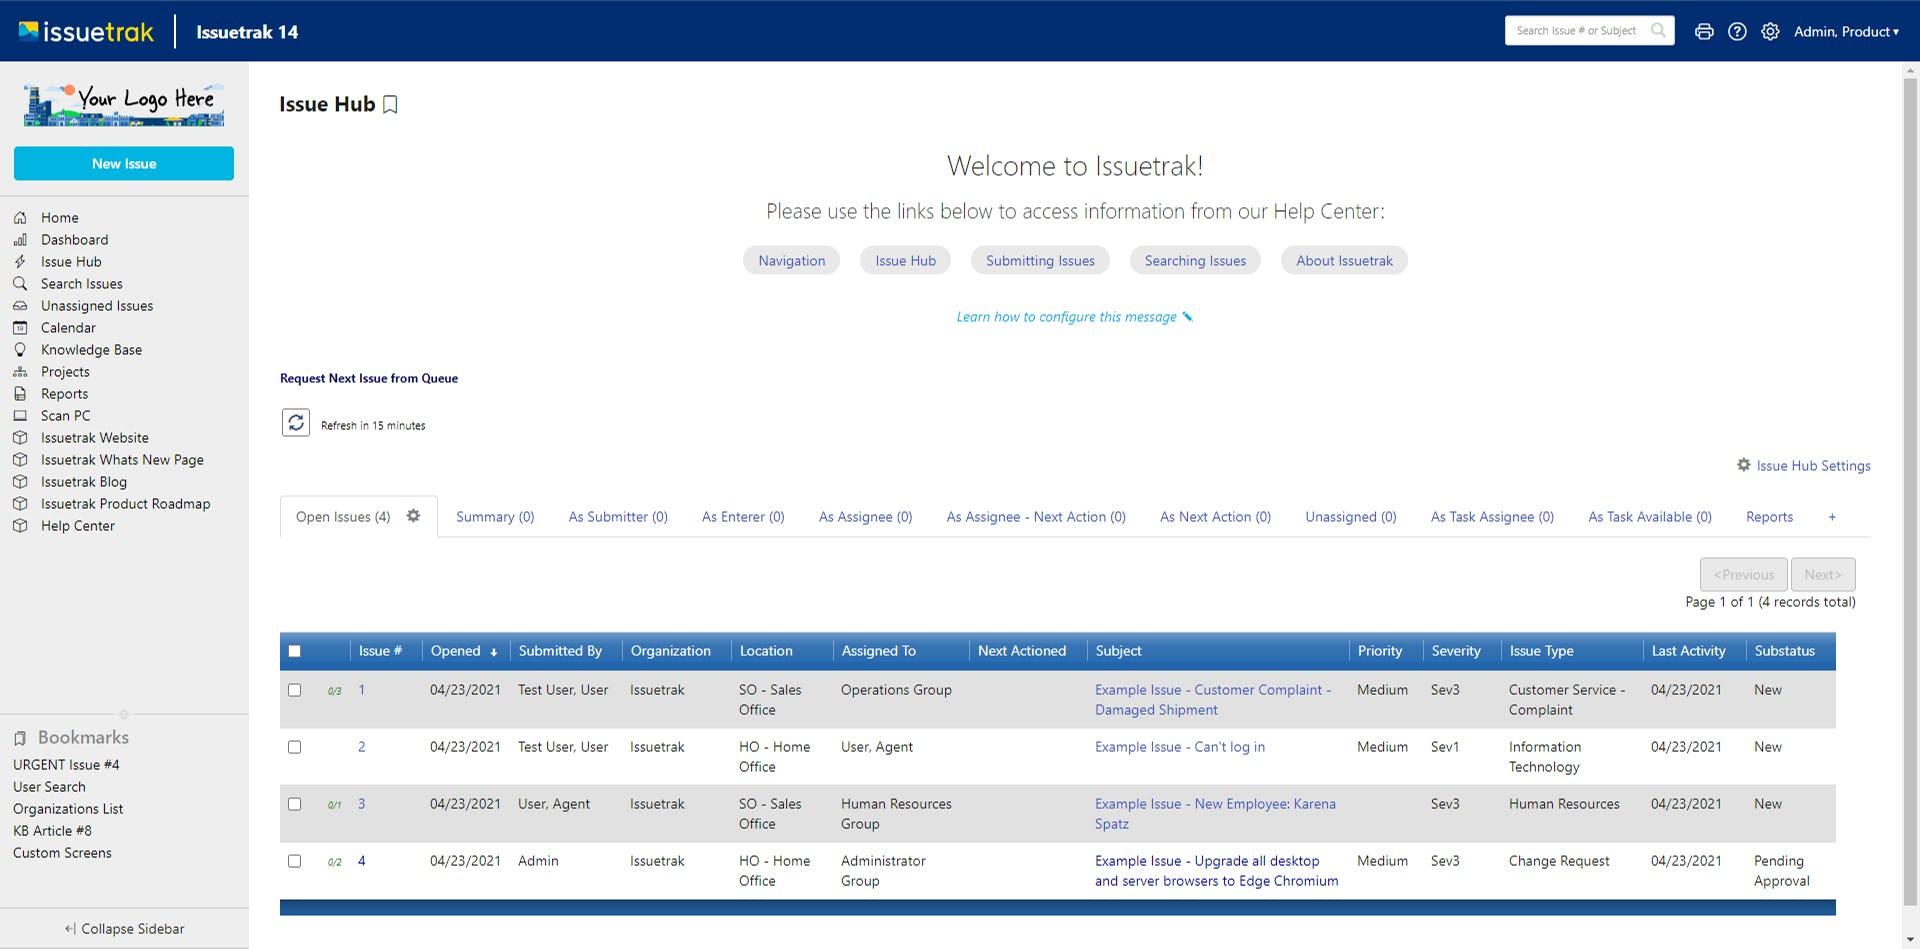 Issuetrak Software - Issue Hub